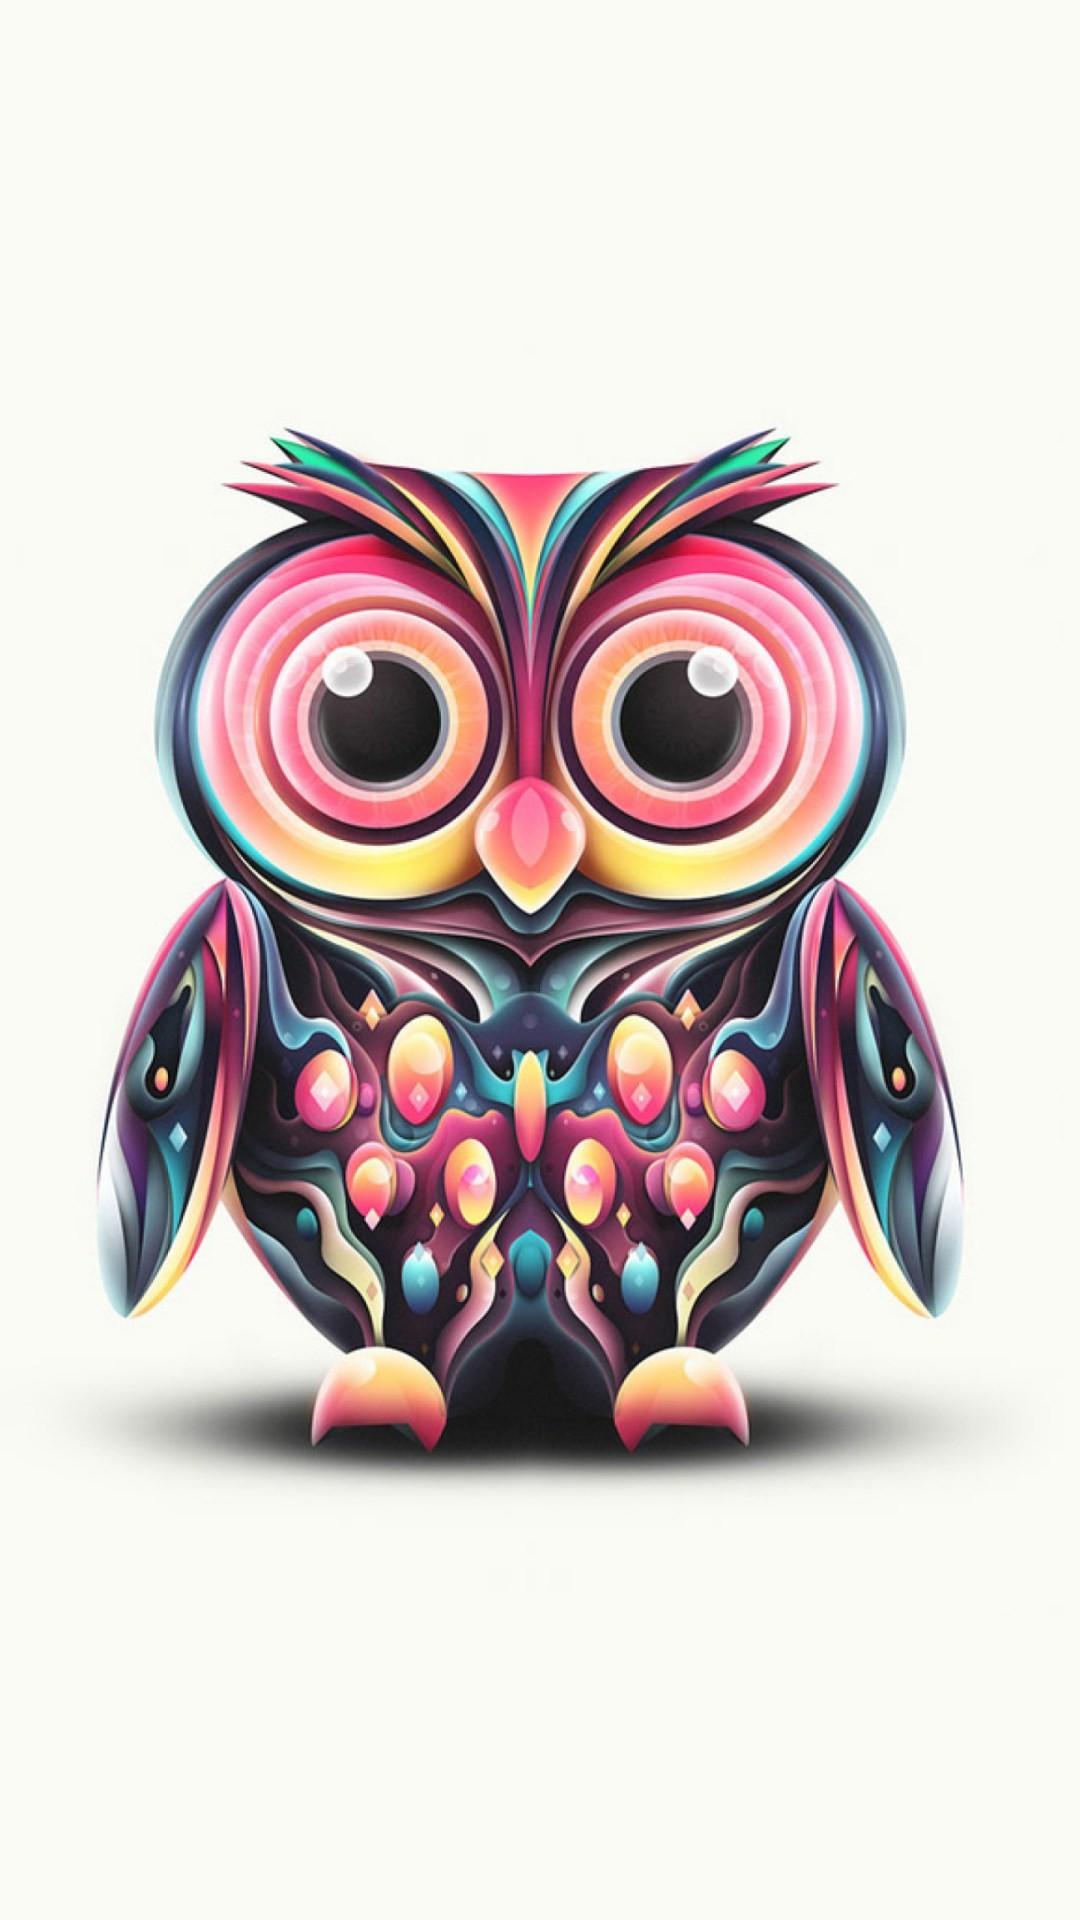 Hd Cute Owl Wallpaper For Android Pixelstalk Net